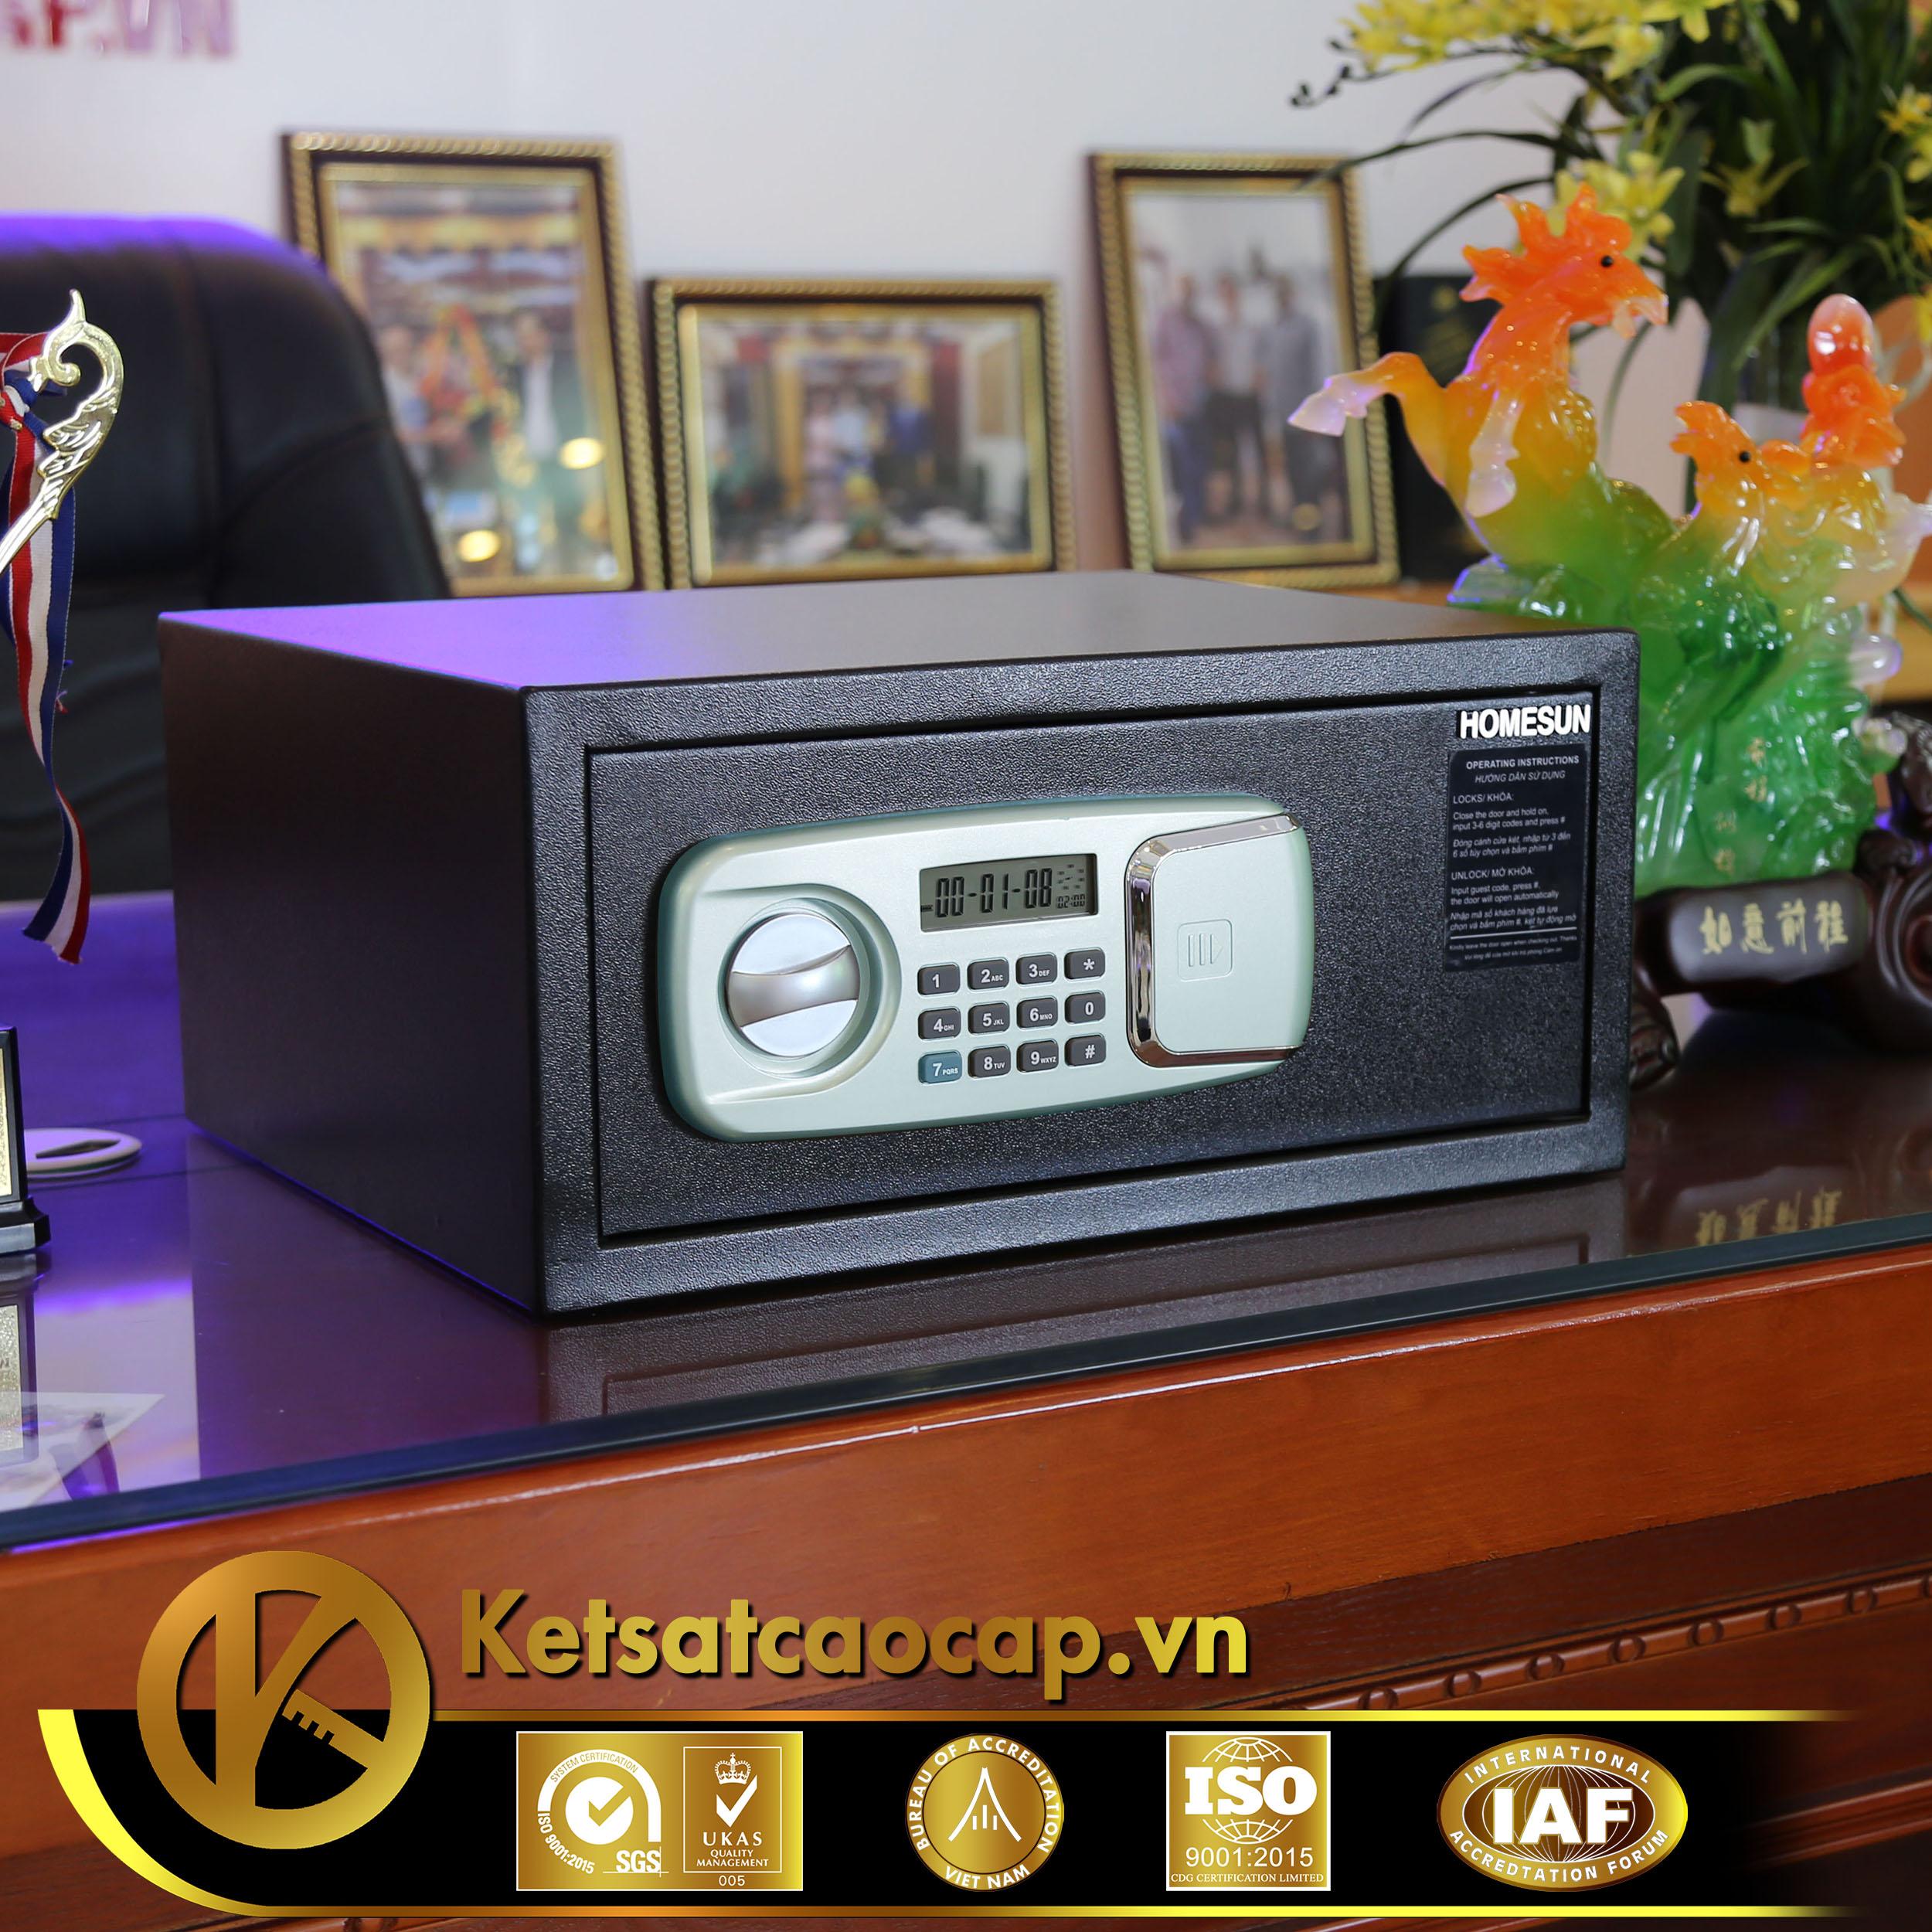 nhà cung cấp ket sat khach san cao cap Phu Quoc WELKO Hotel Safe